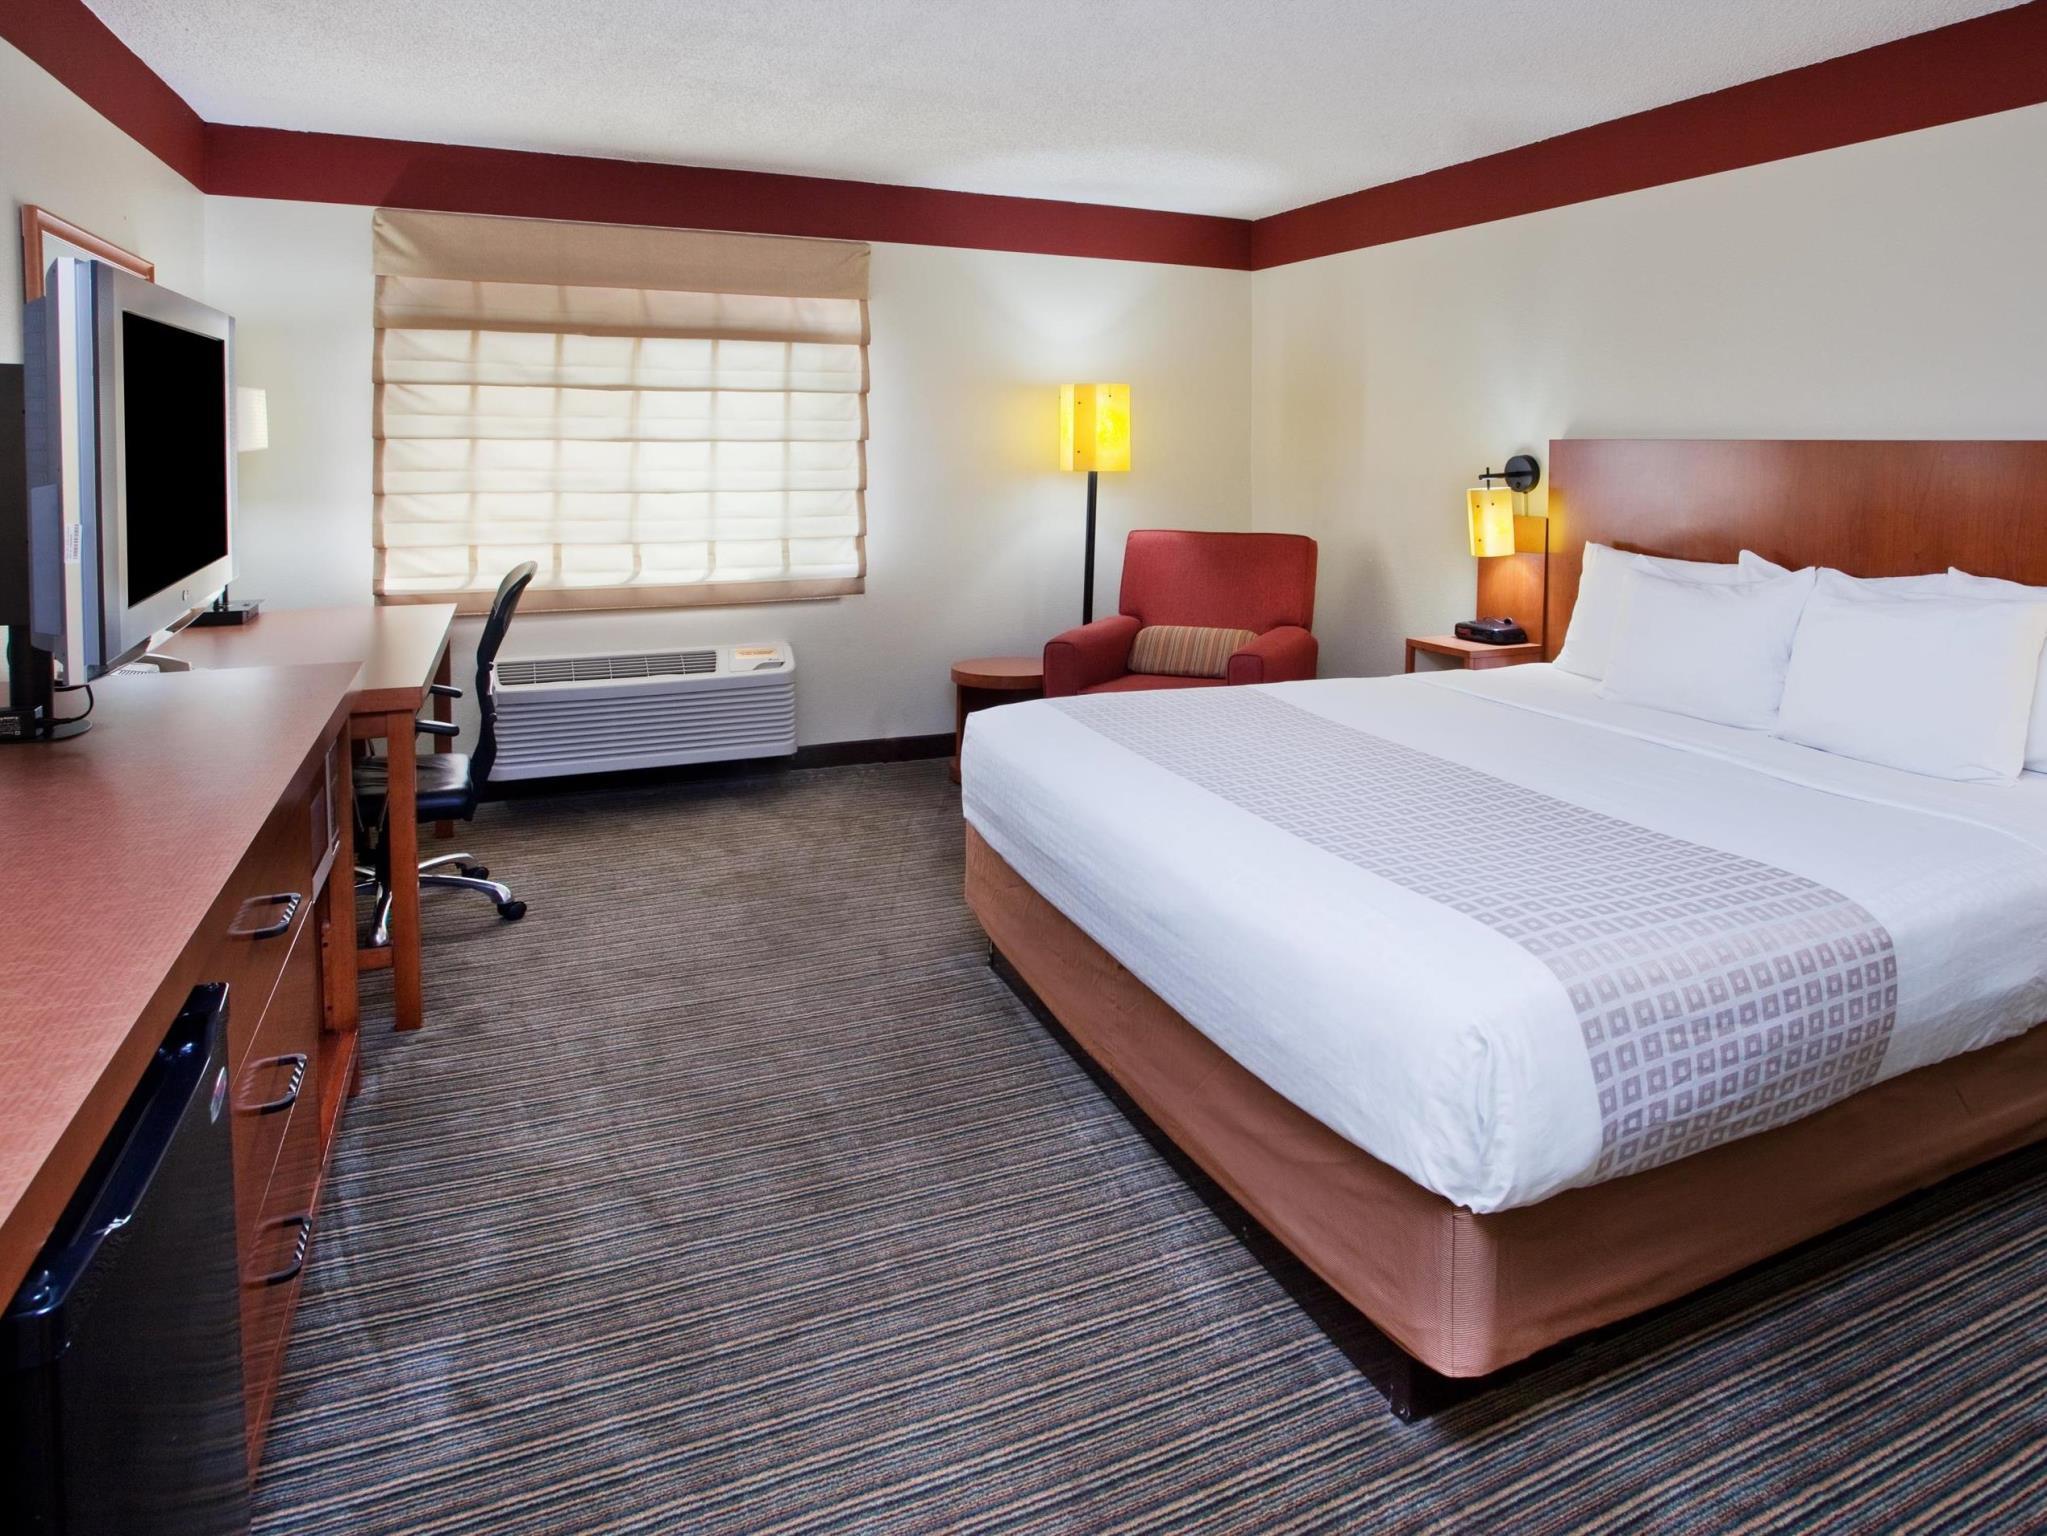 La Quinta Inn & Suites By Wyndham Savannah Southside